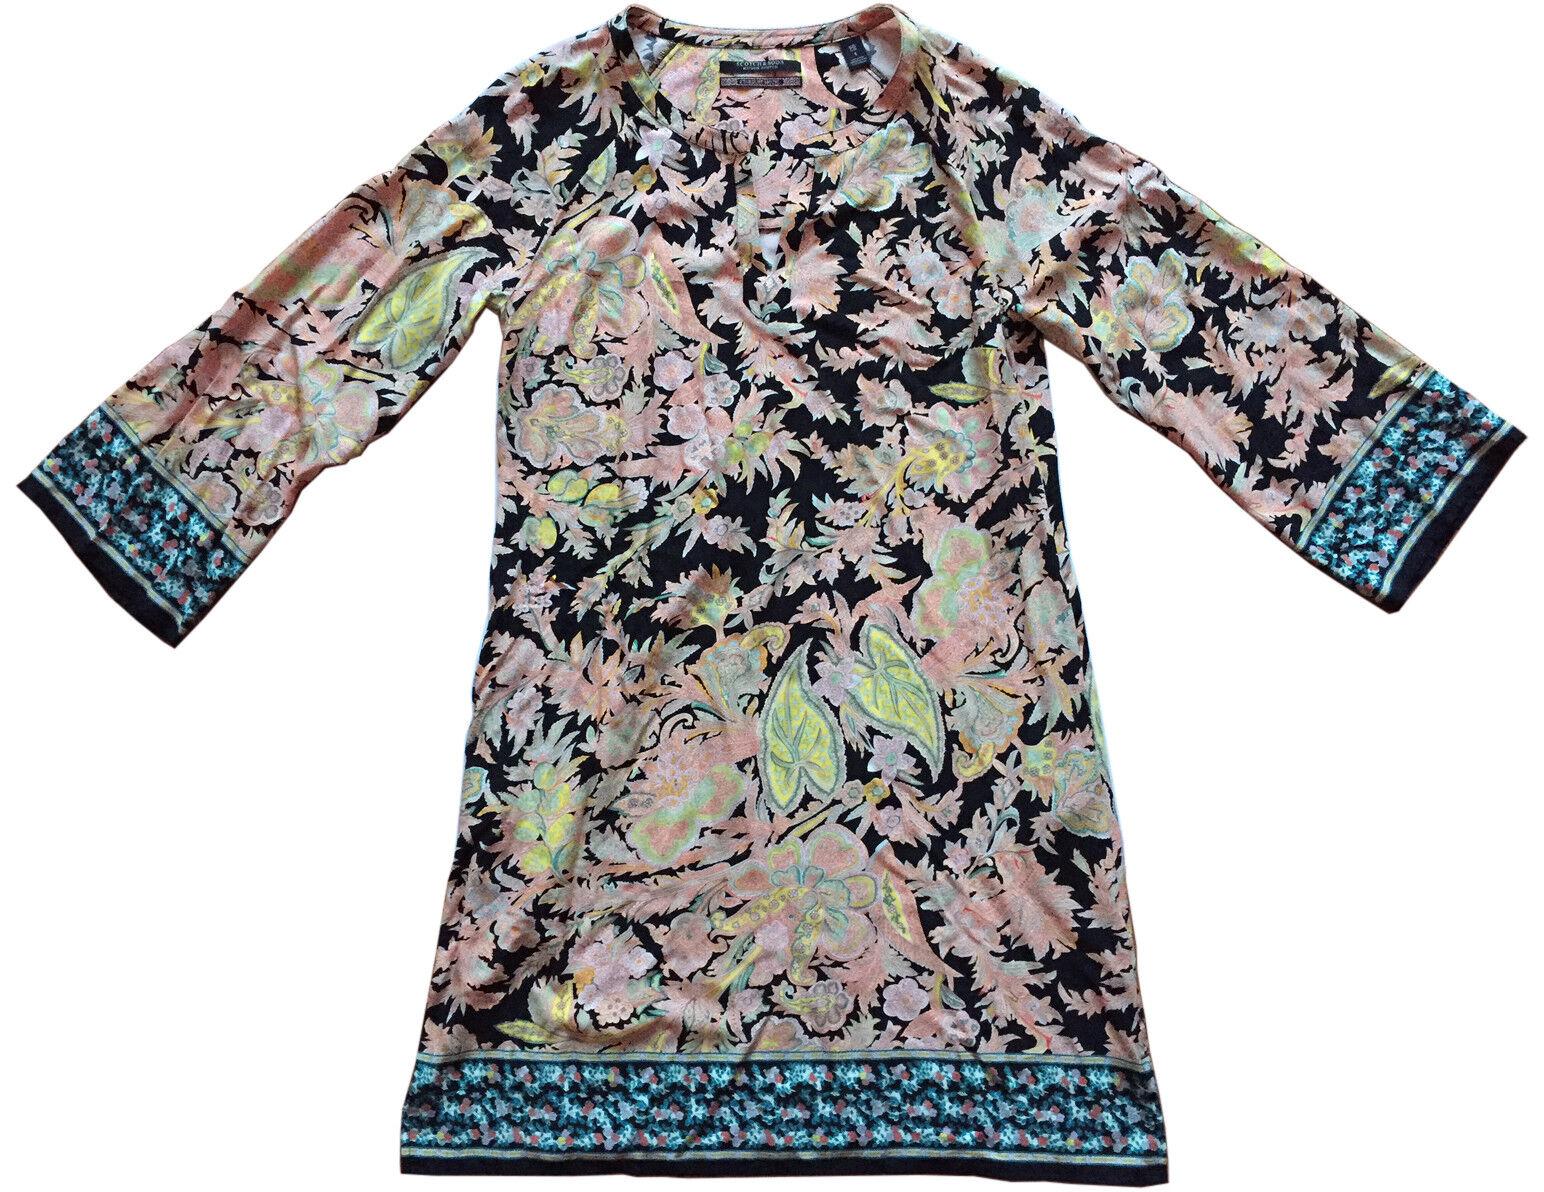 SCOTCH & SODA Bell-Sleeved Paisley Tunic Dress 100% Viscose  Stardust Motel  Sz1